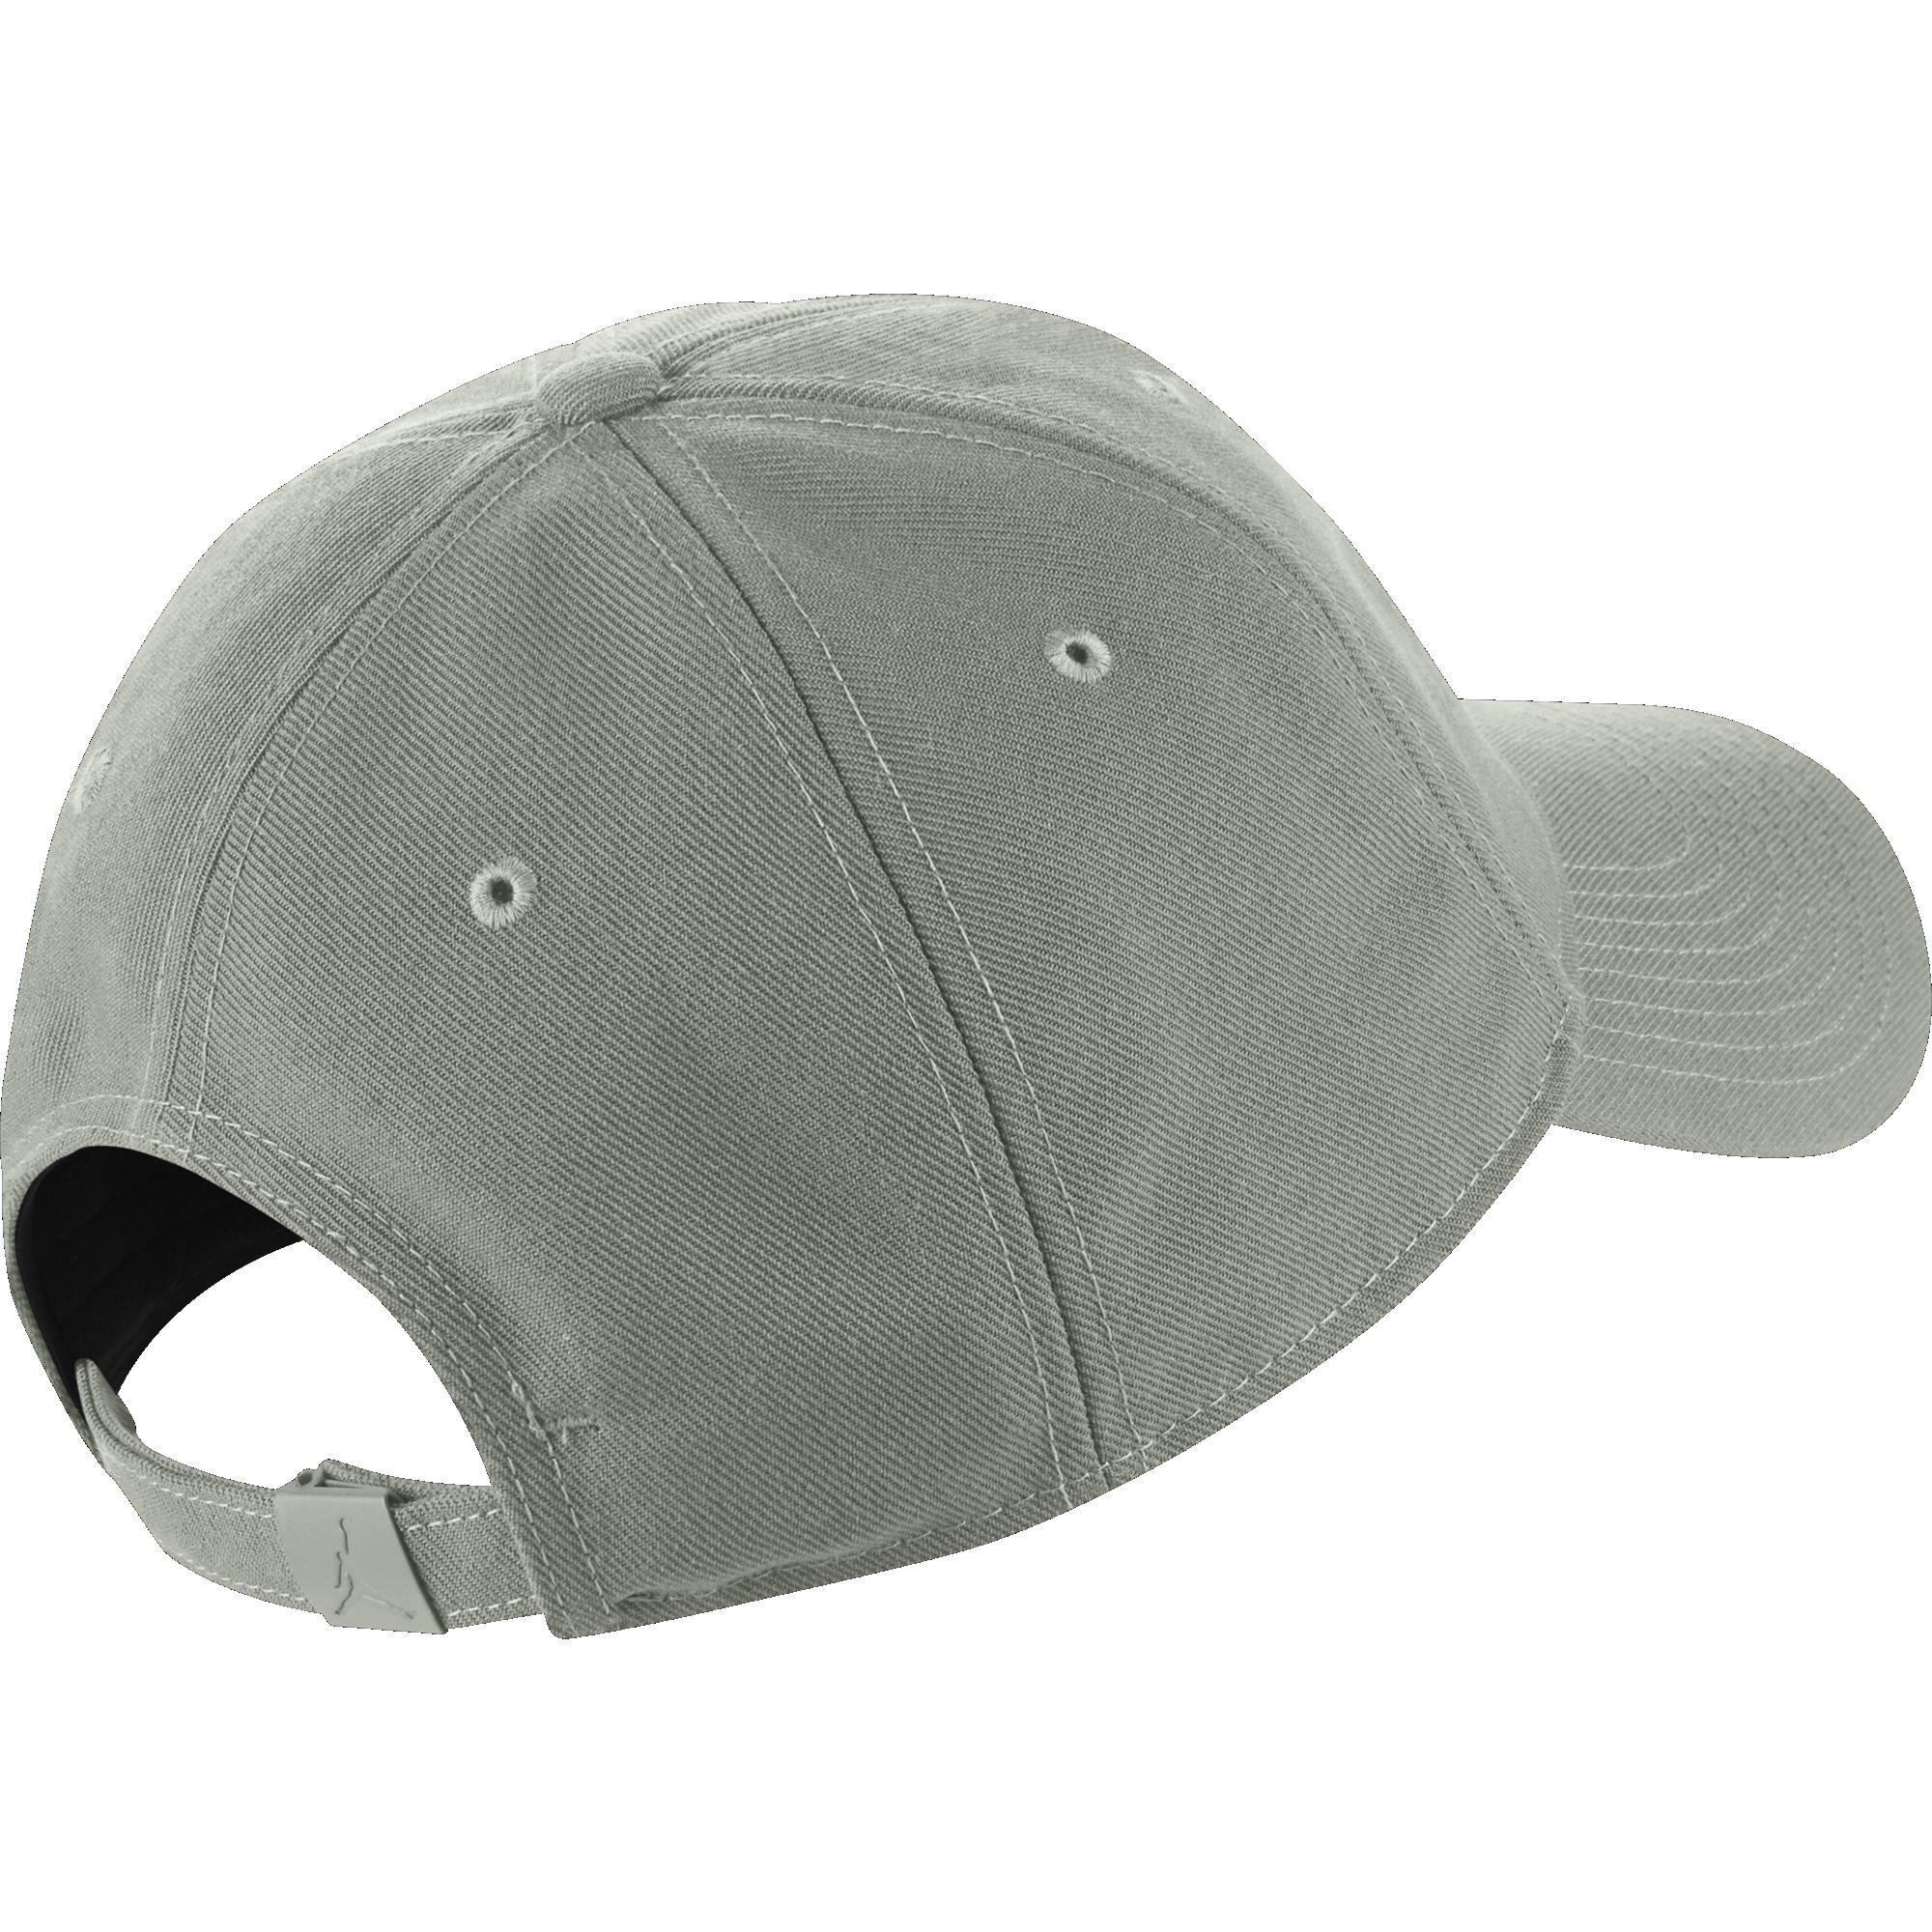 5640d8285a21 AIR JORDAN JUMPMAN FLOPPY H86 HAT for 250.00SEK